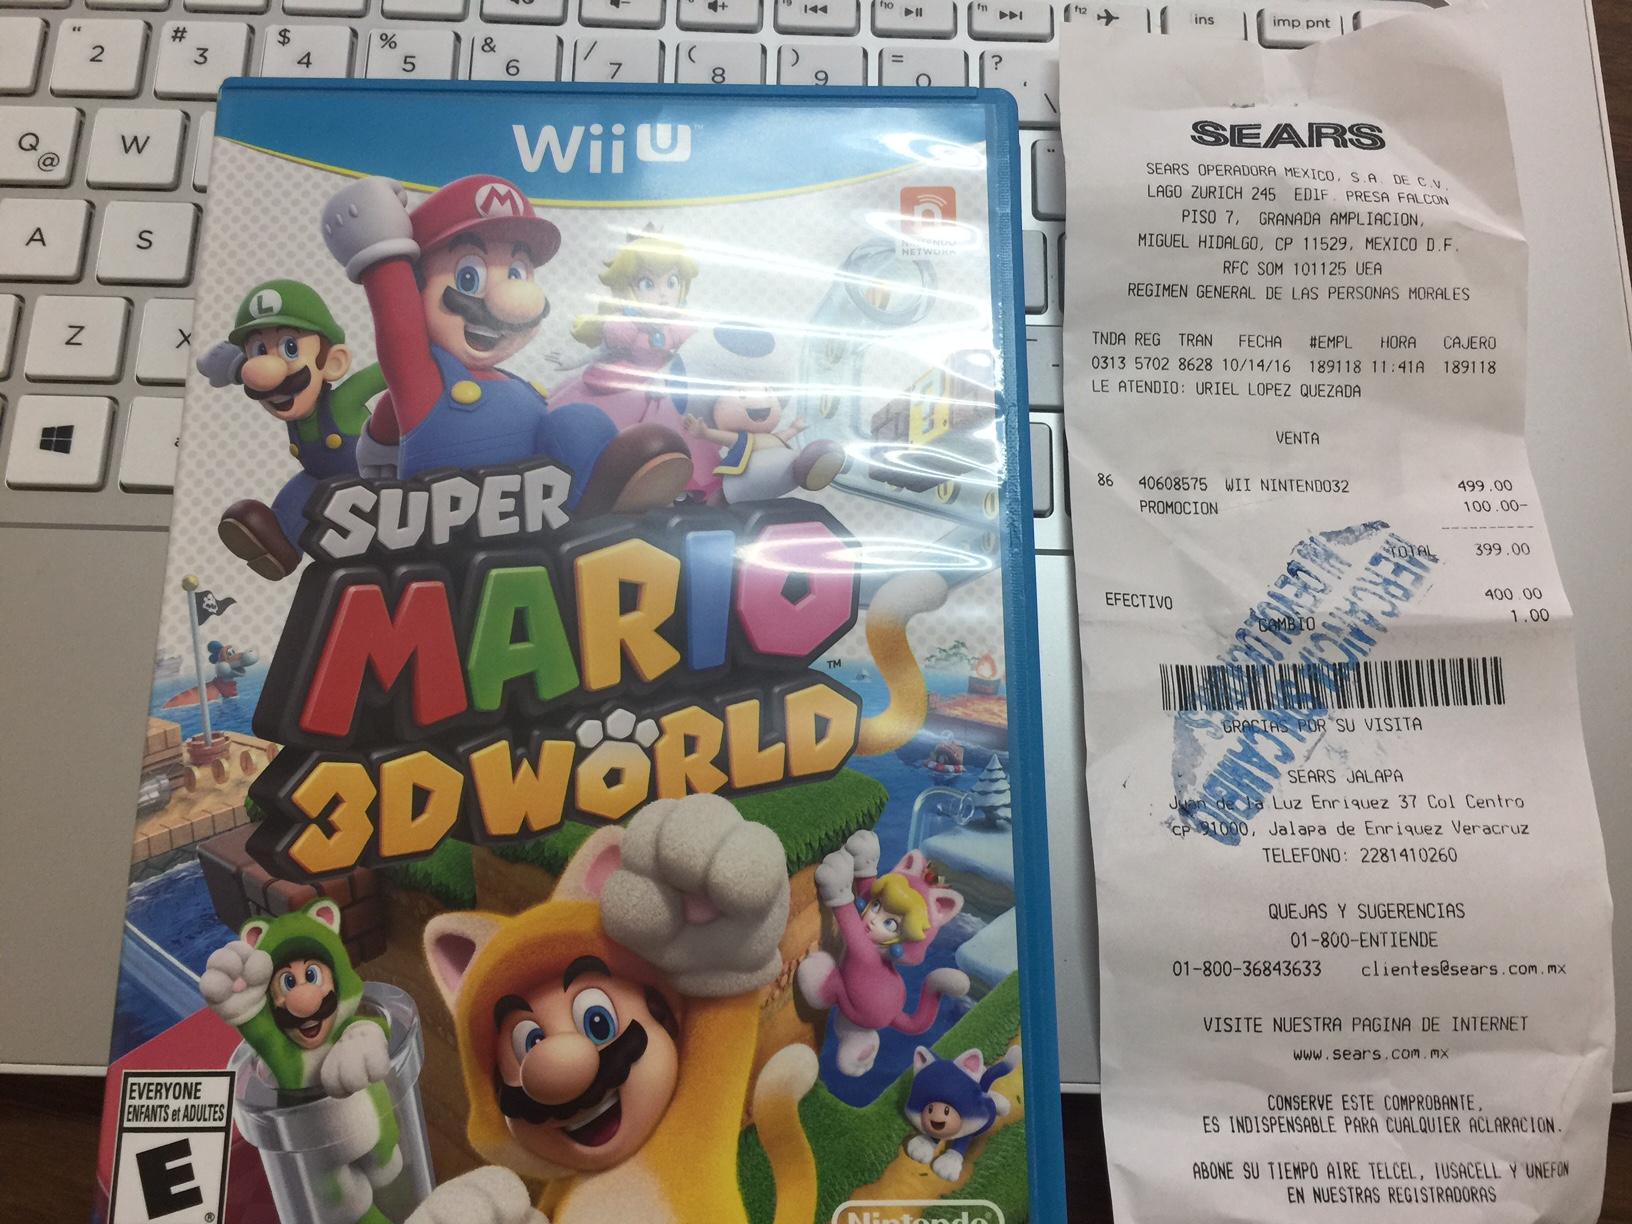 Sears Jalapa: Super Mario 3D World Wii U